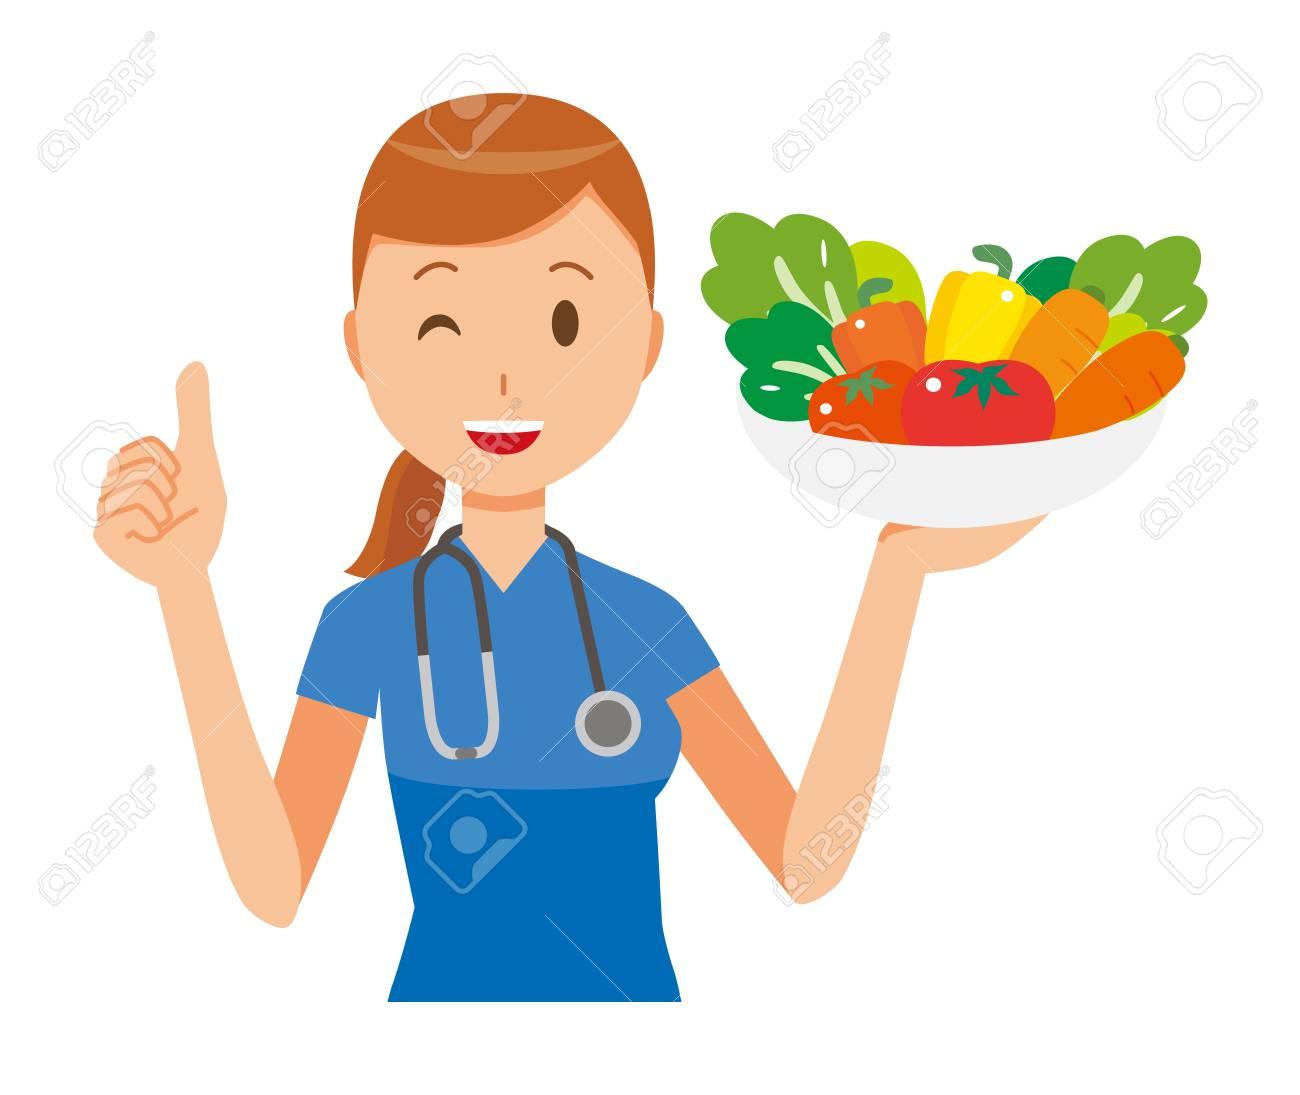 A woman nurse wearing a blue scrub holding vegetables. - 91170942